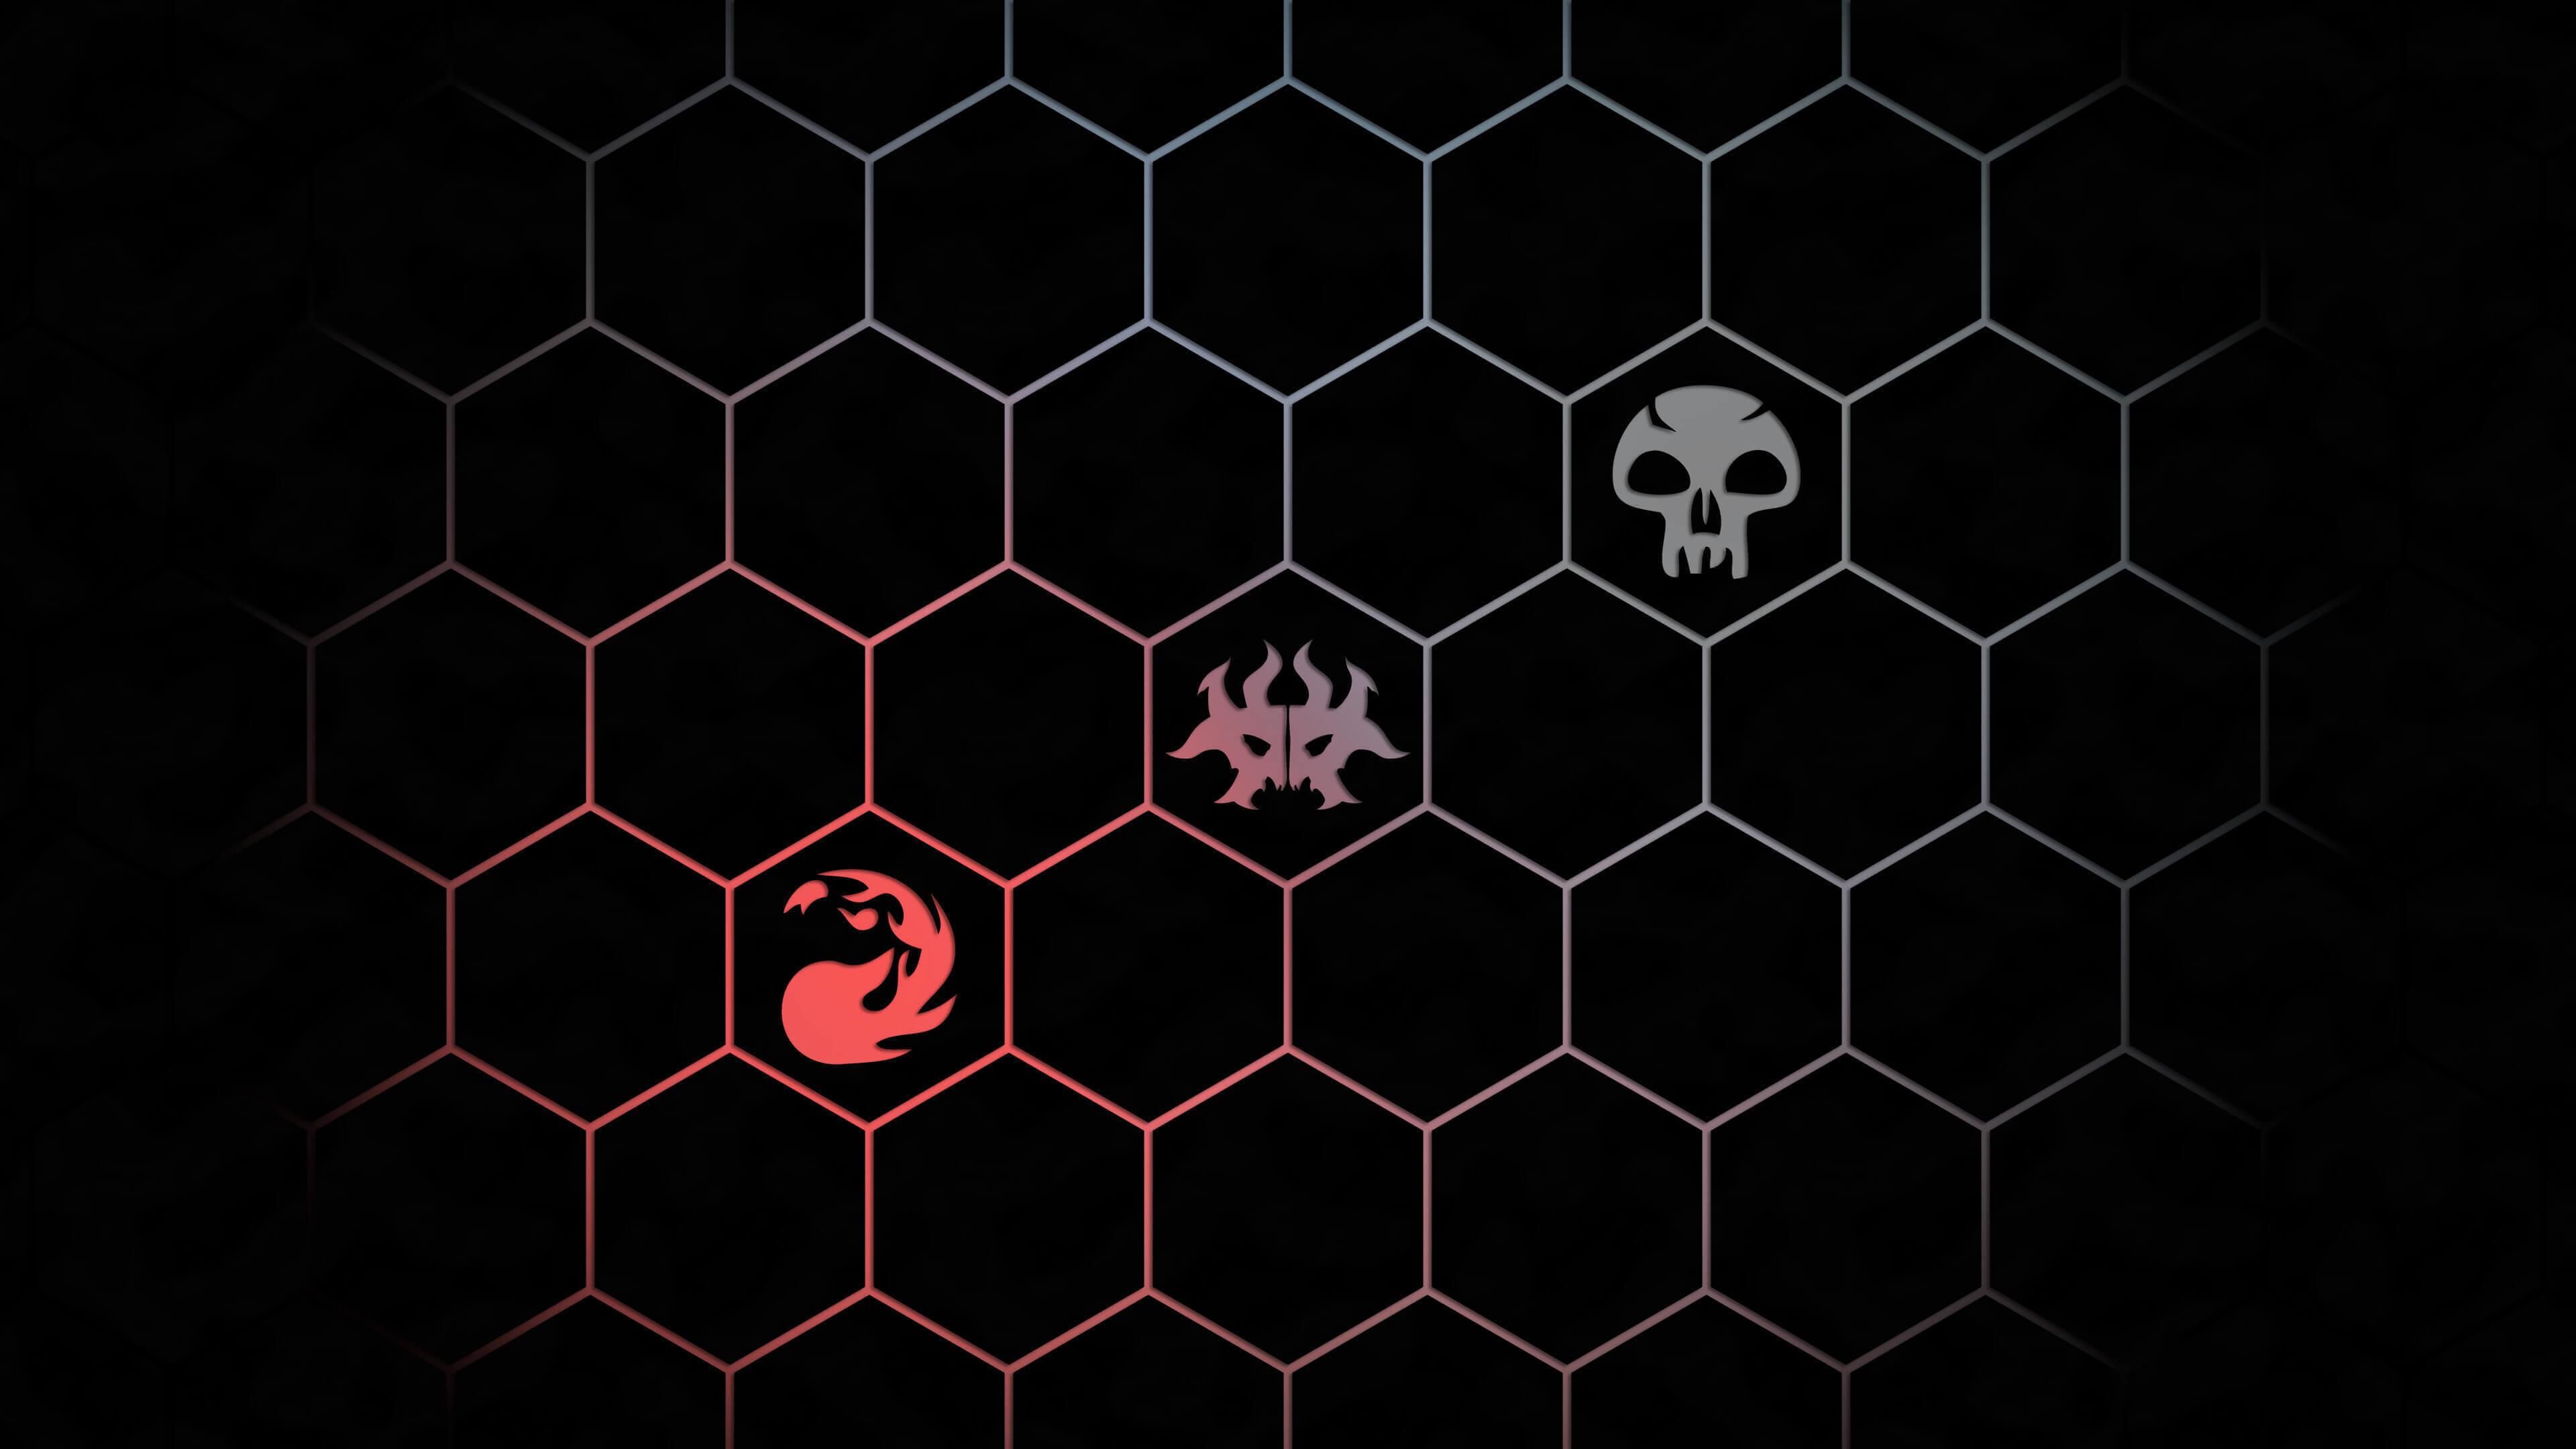 magic the gathering black mana and red mana background uhd 4k wallpaper